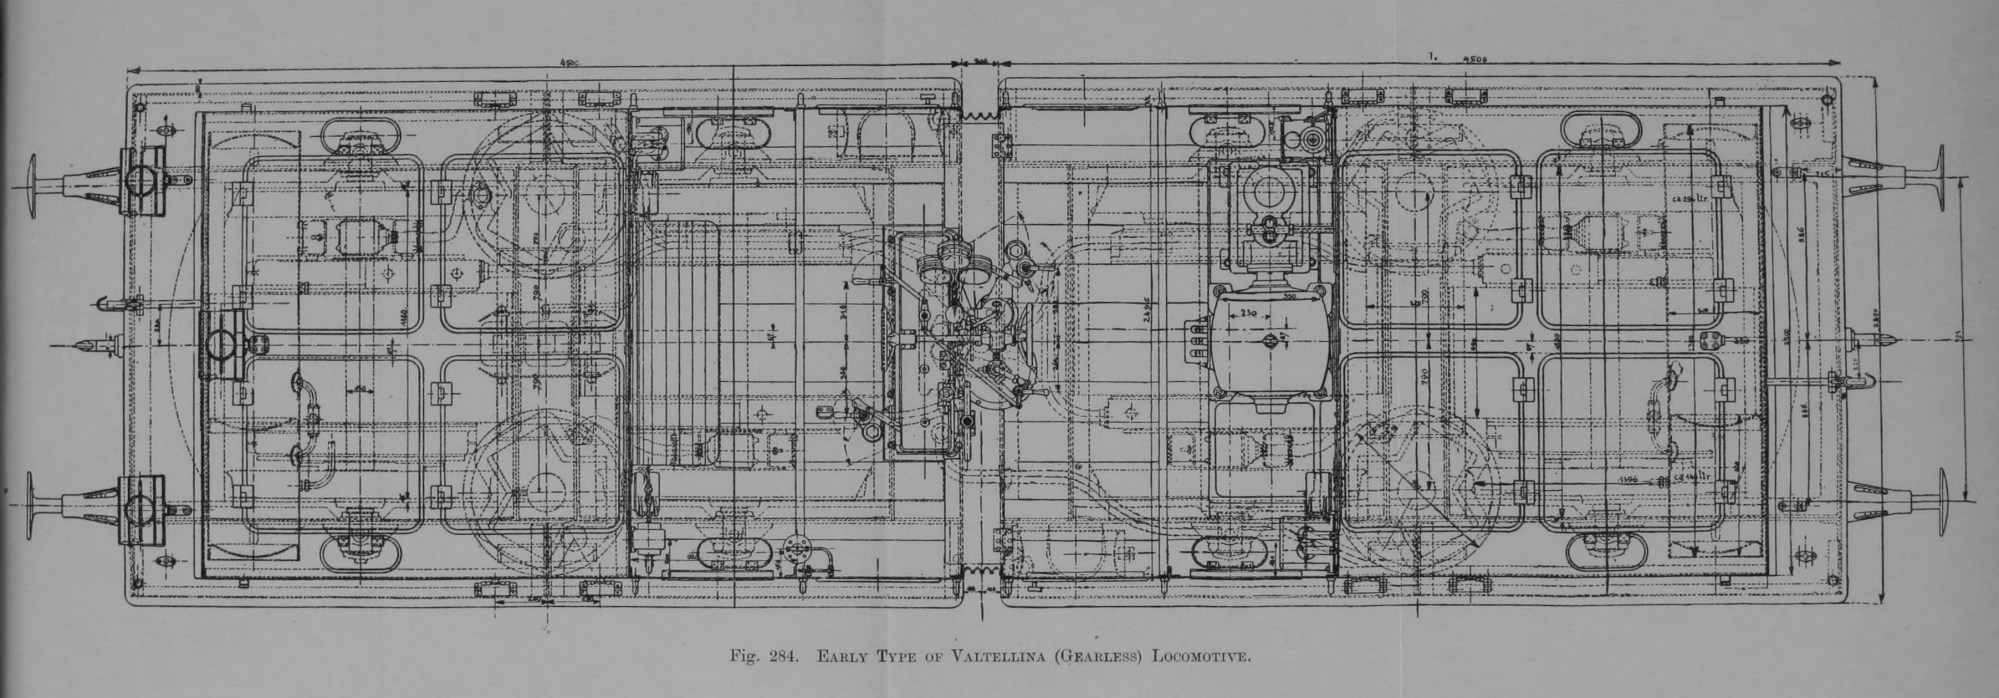 hight resolution of early type of valtellina gearless locomotive jpg